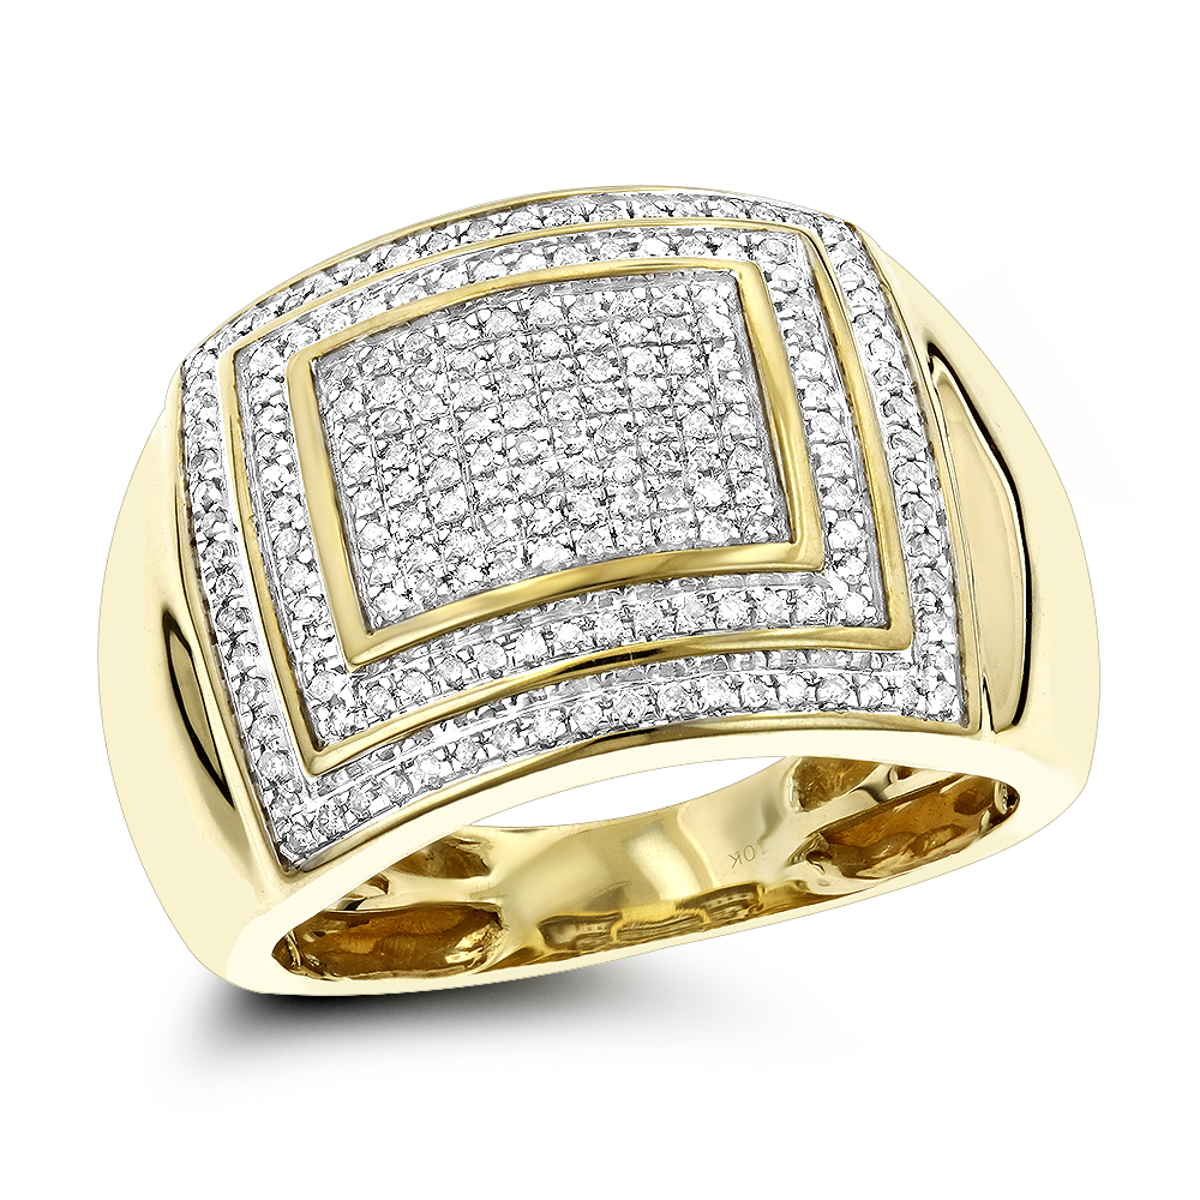 1/2 Carat 10K Gold Diamond Ring for Men by Luxurman